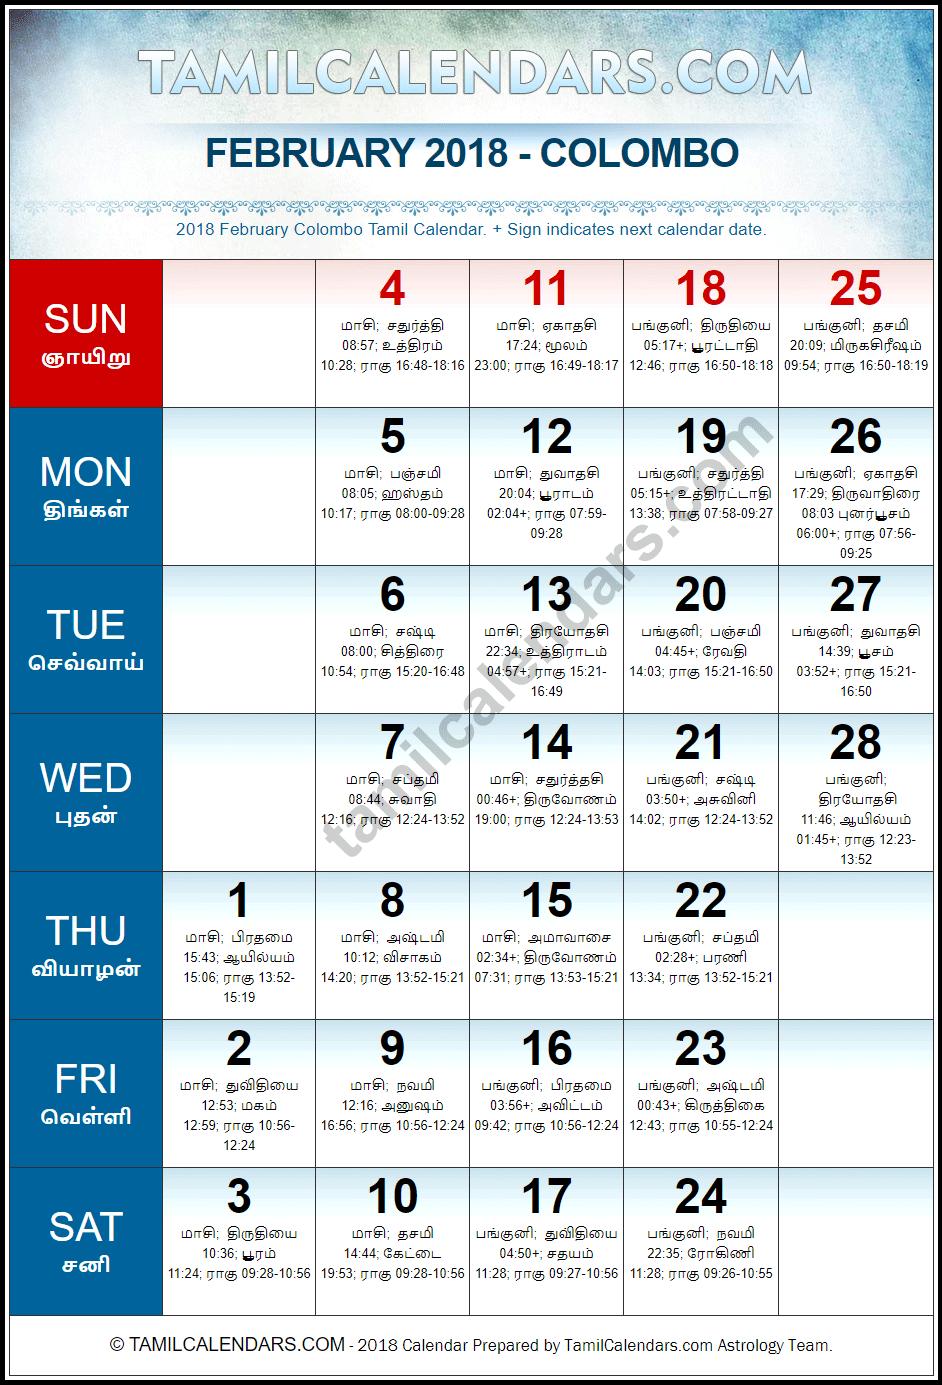 February 2018 Sri Lanka Tamil Calendar | Download USA Tamil ...